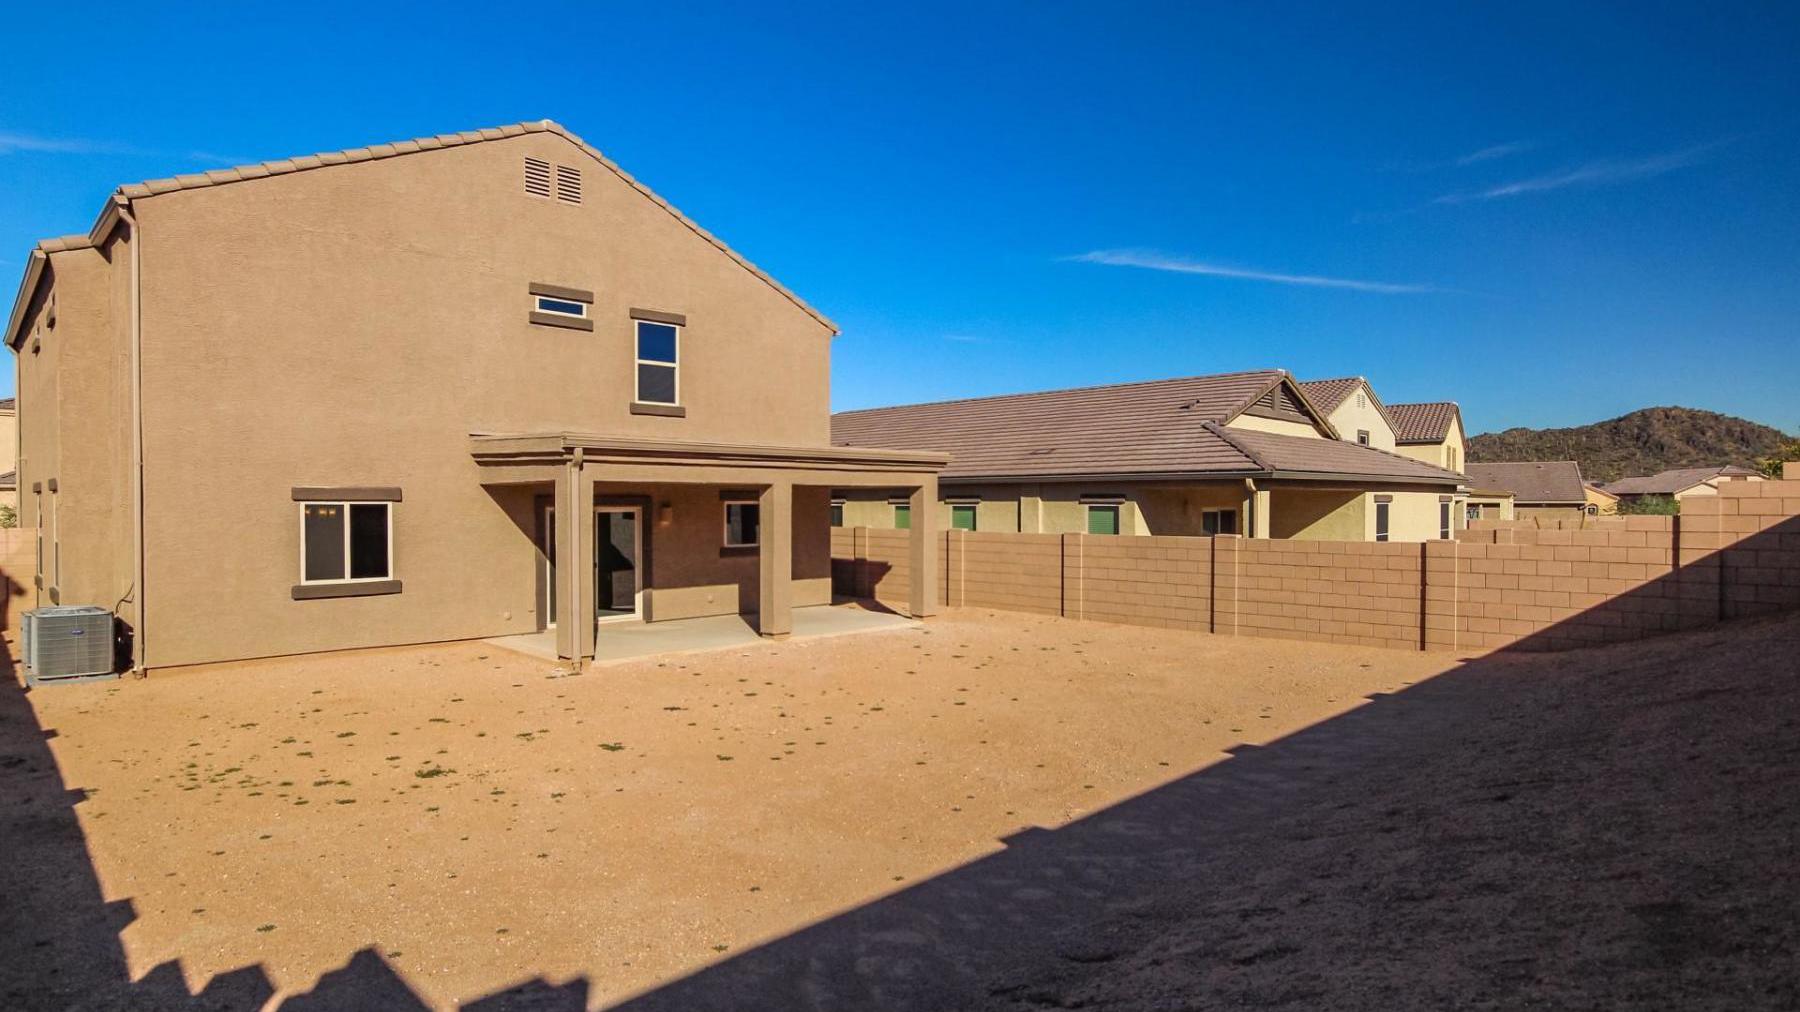 D.R. Horton Vanderbilt Farms Pueblo - Plan 4081 Plan